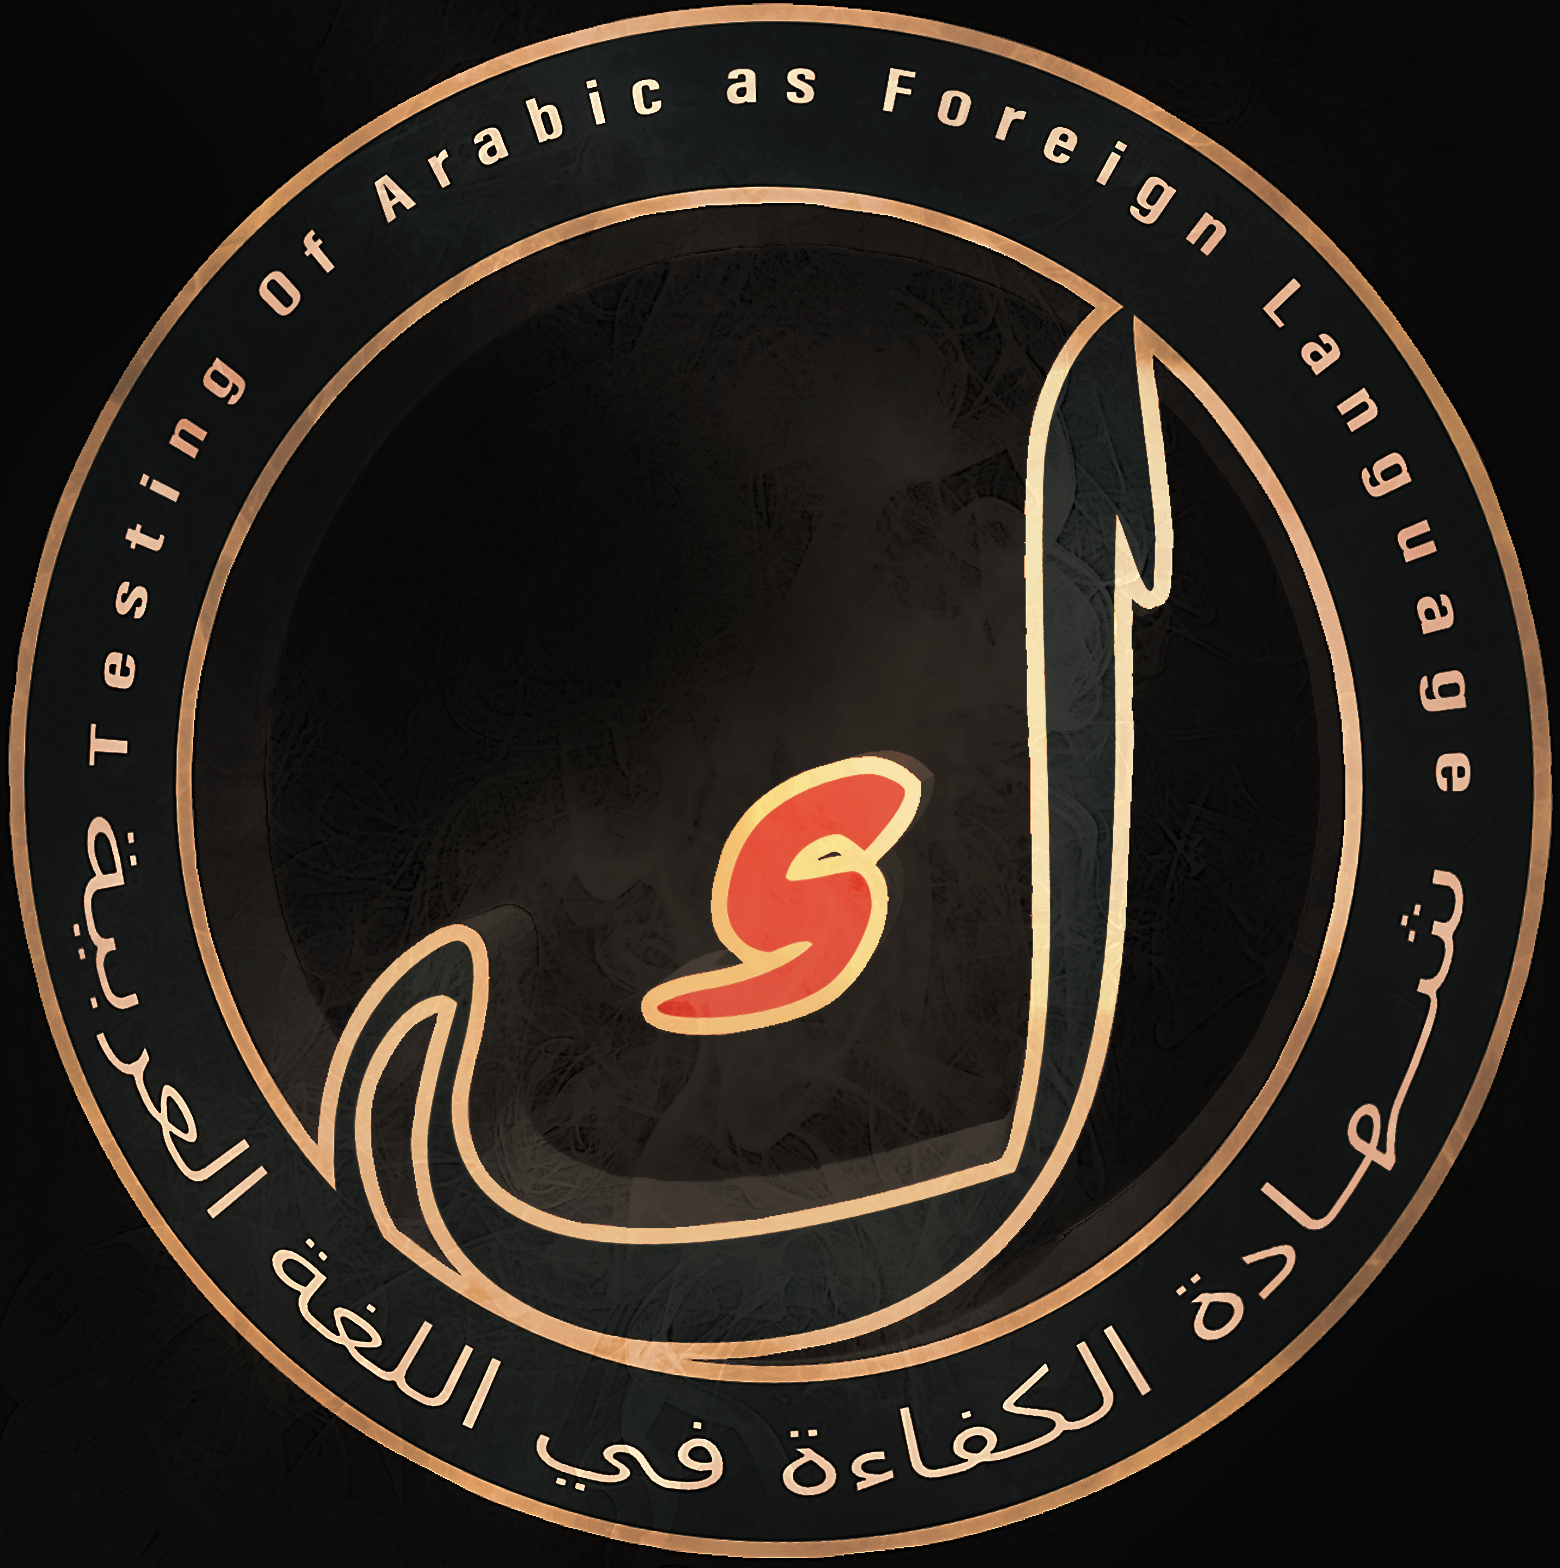 Arabisch Zertifikat, Arabisch Test, Arabic Test, Arabic Certificate